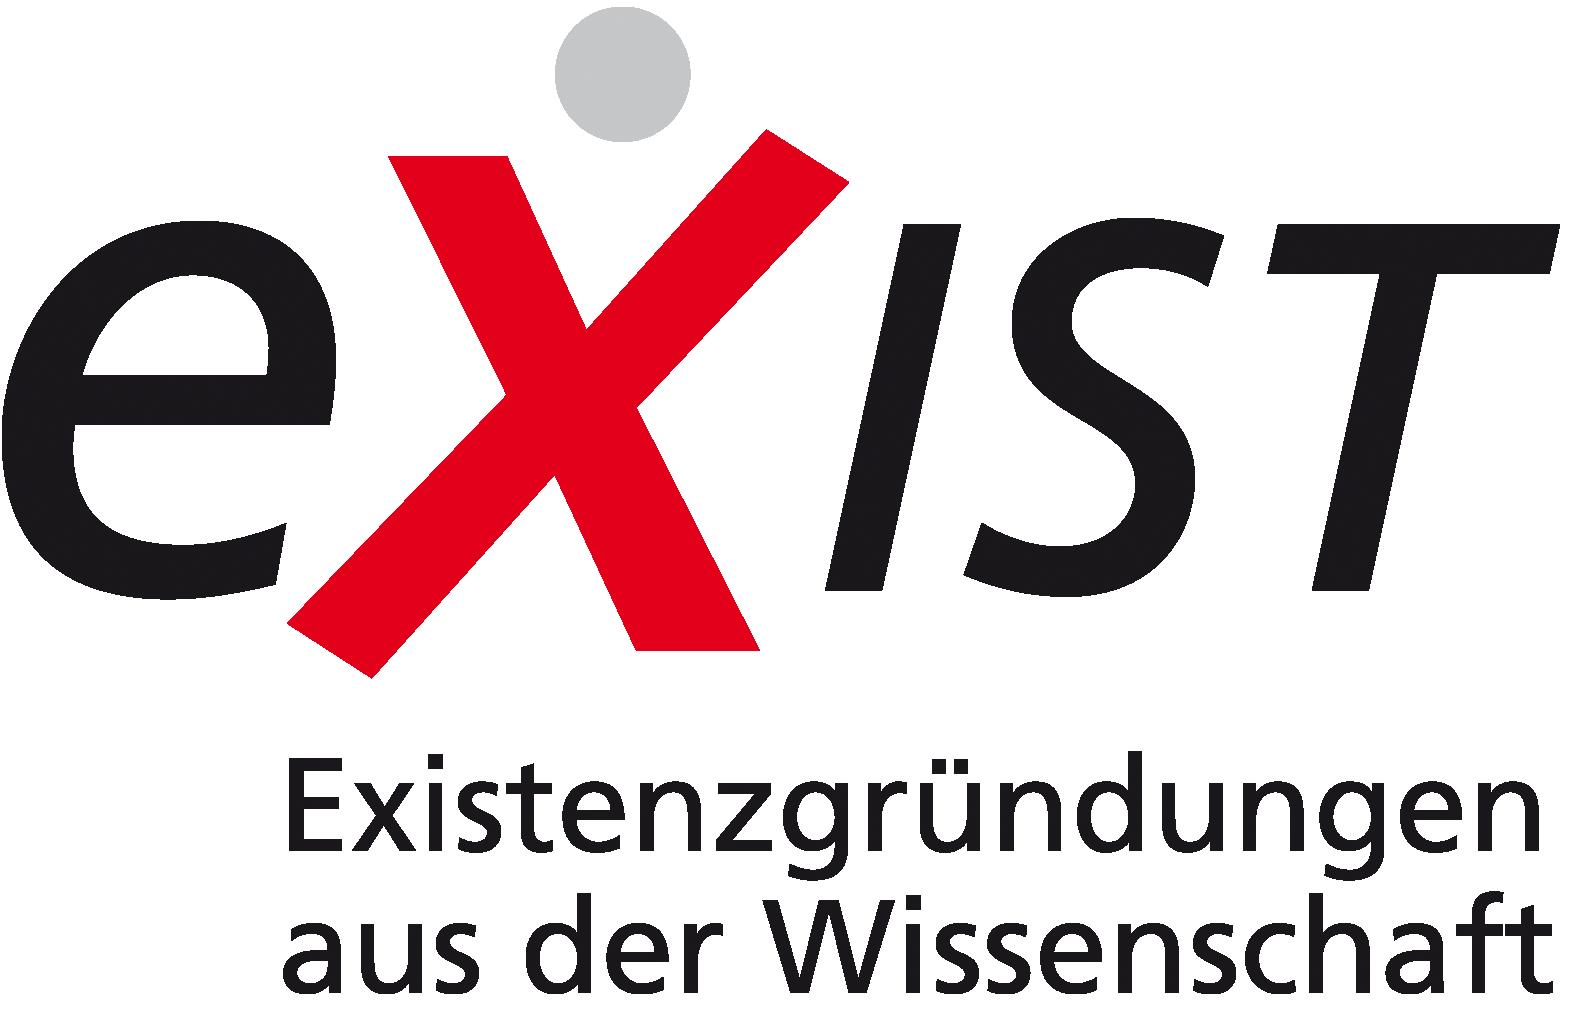 Logo exist png